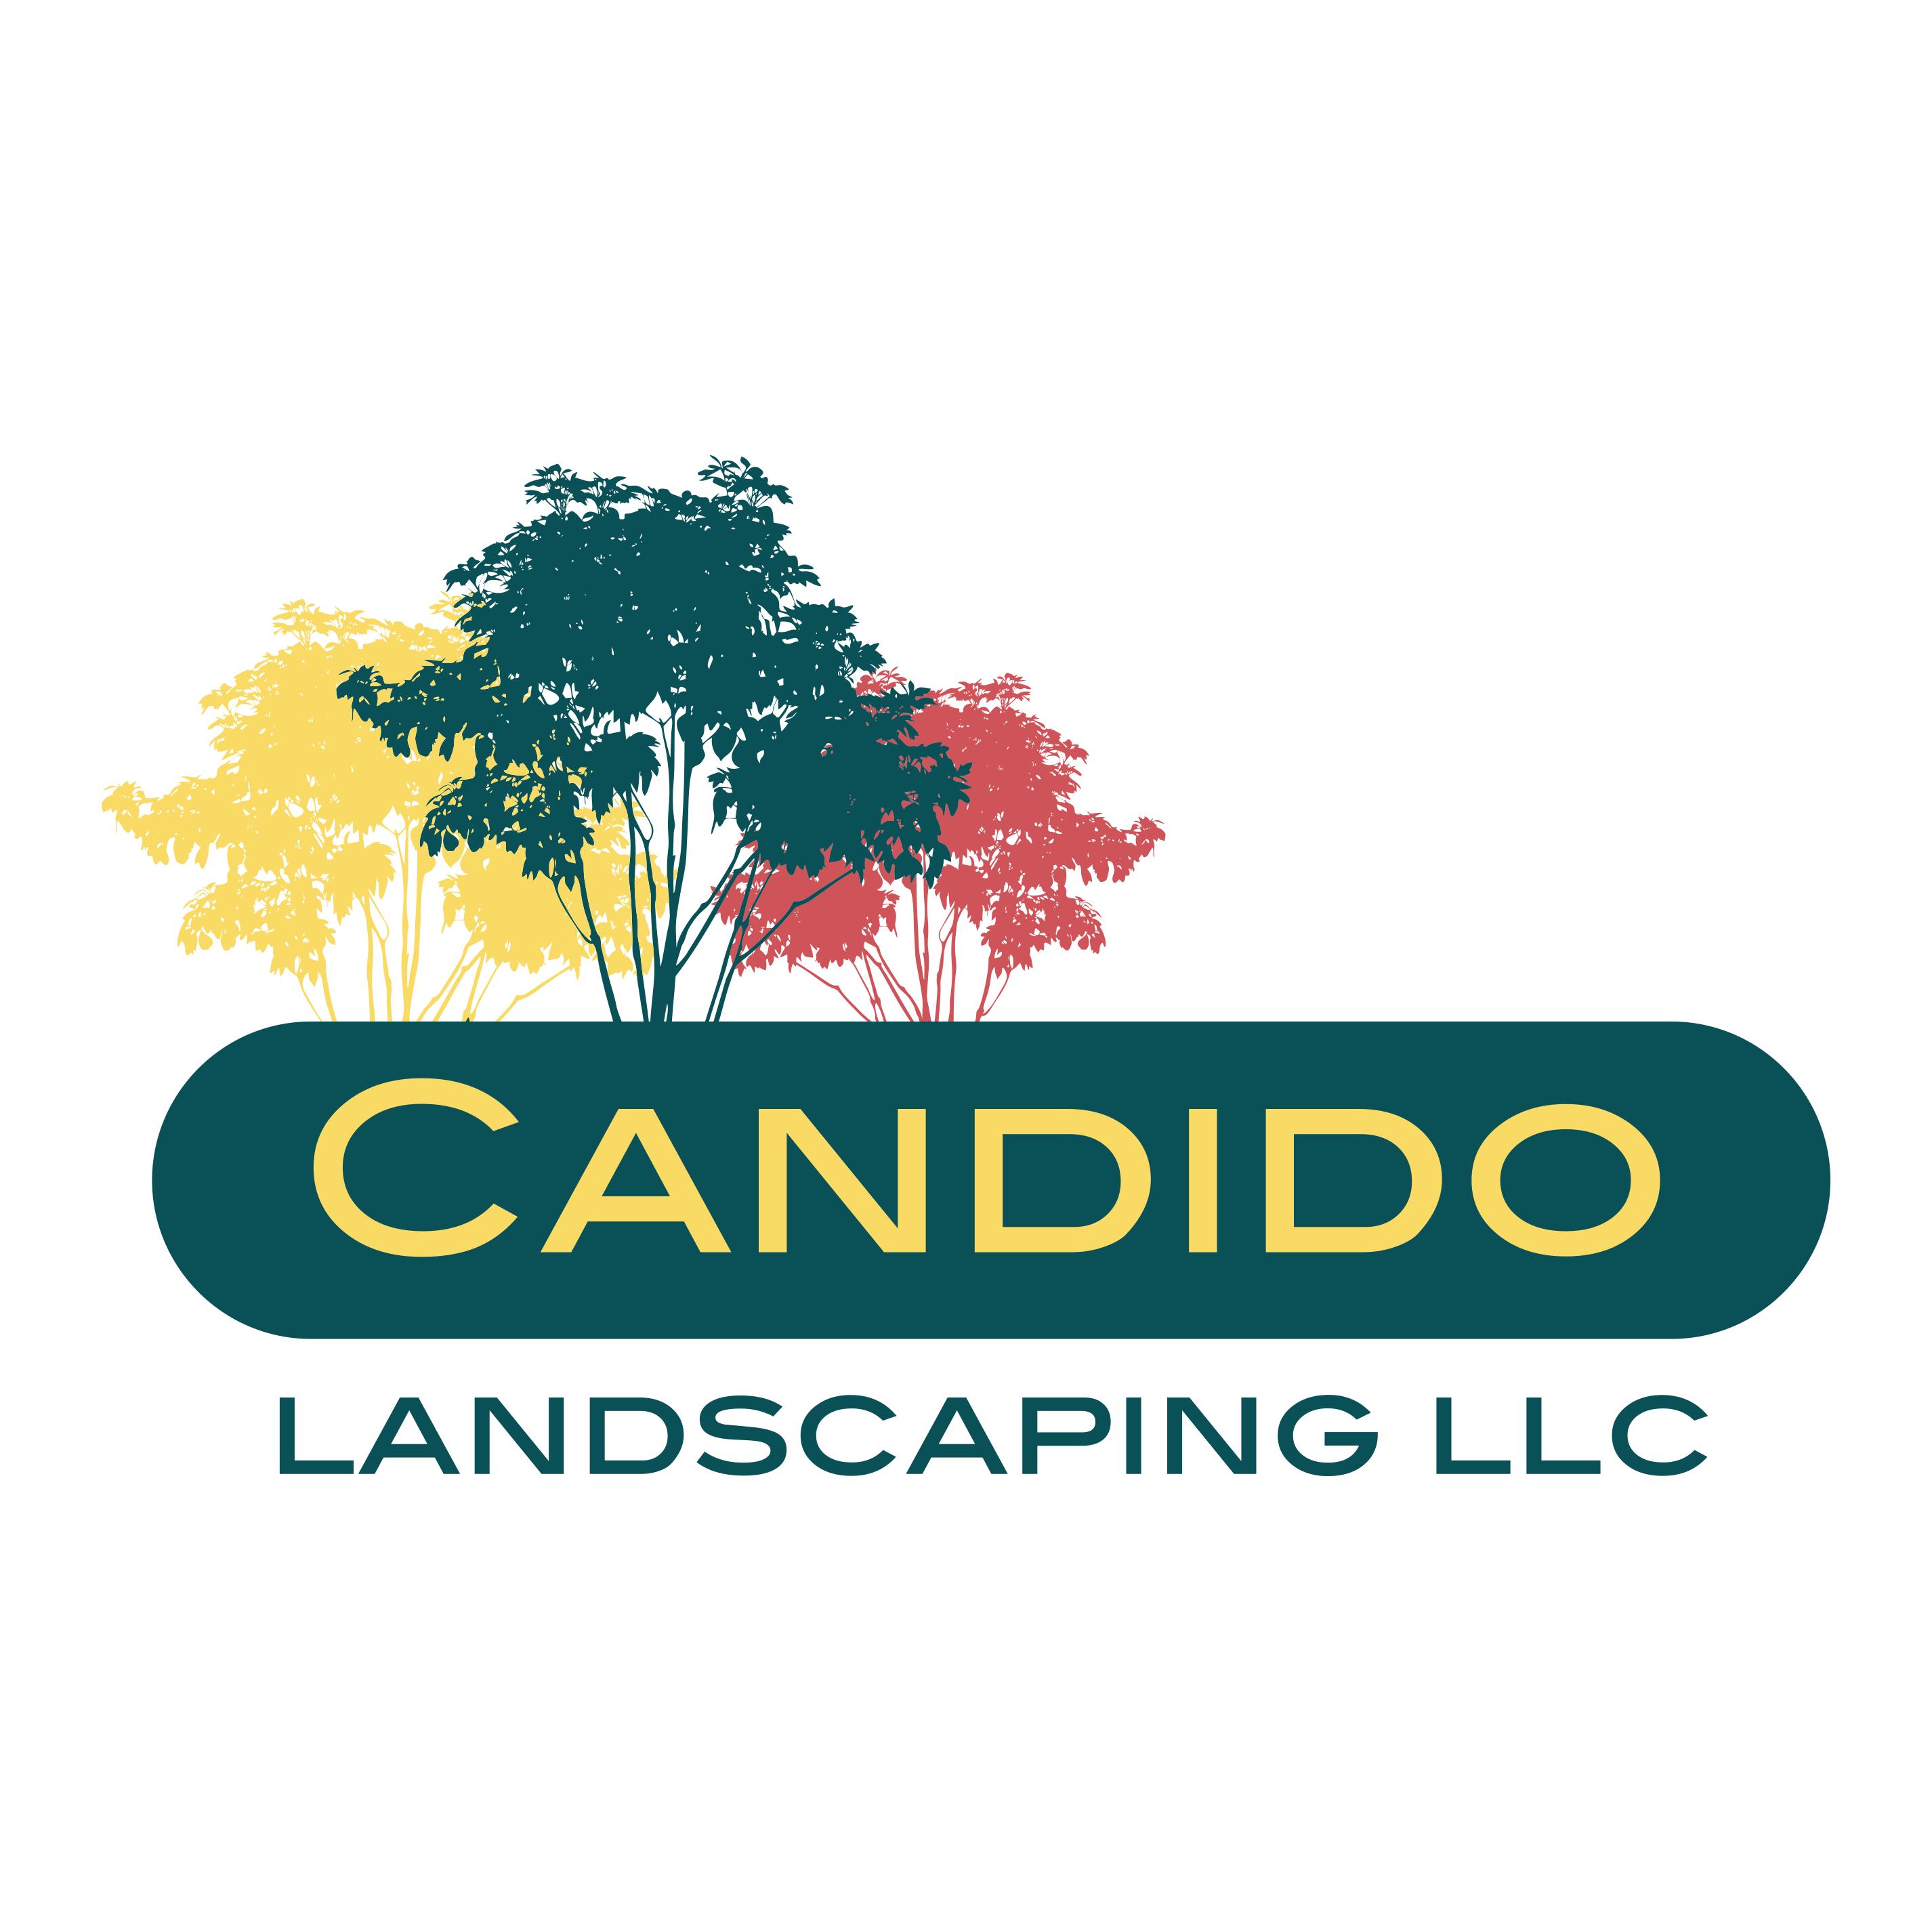 Candido Landscaping LLC